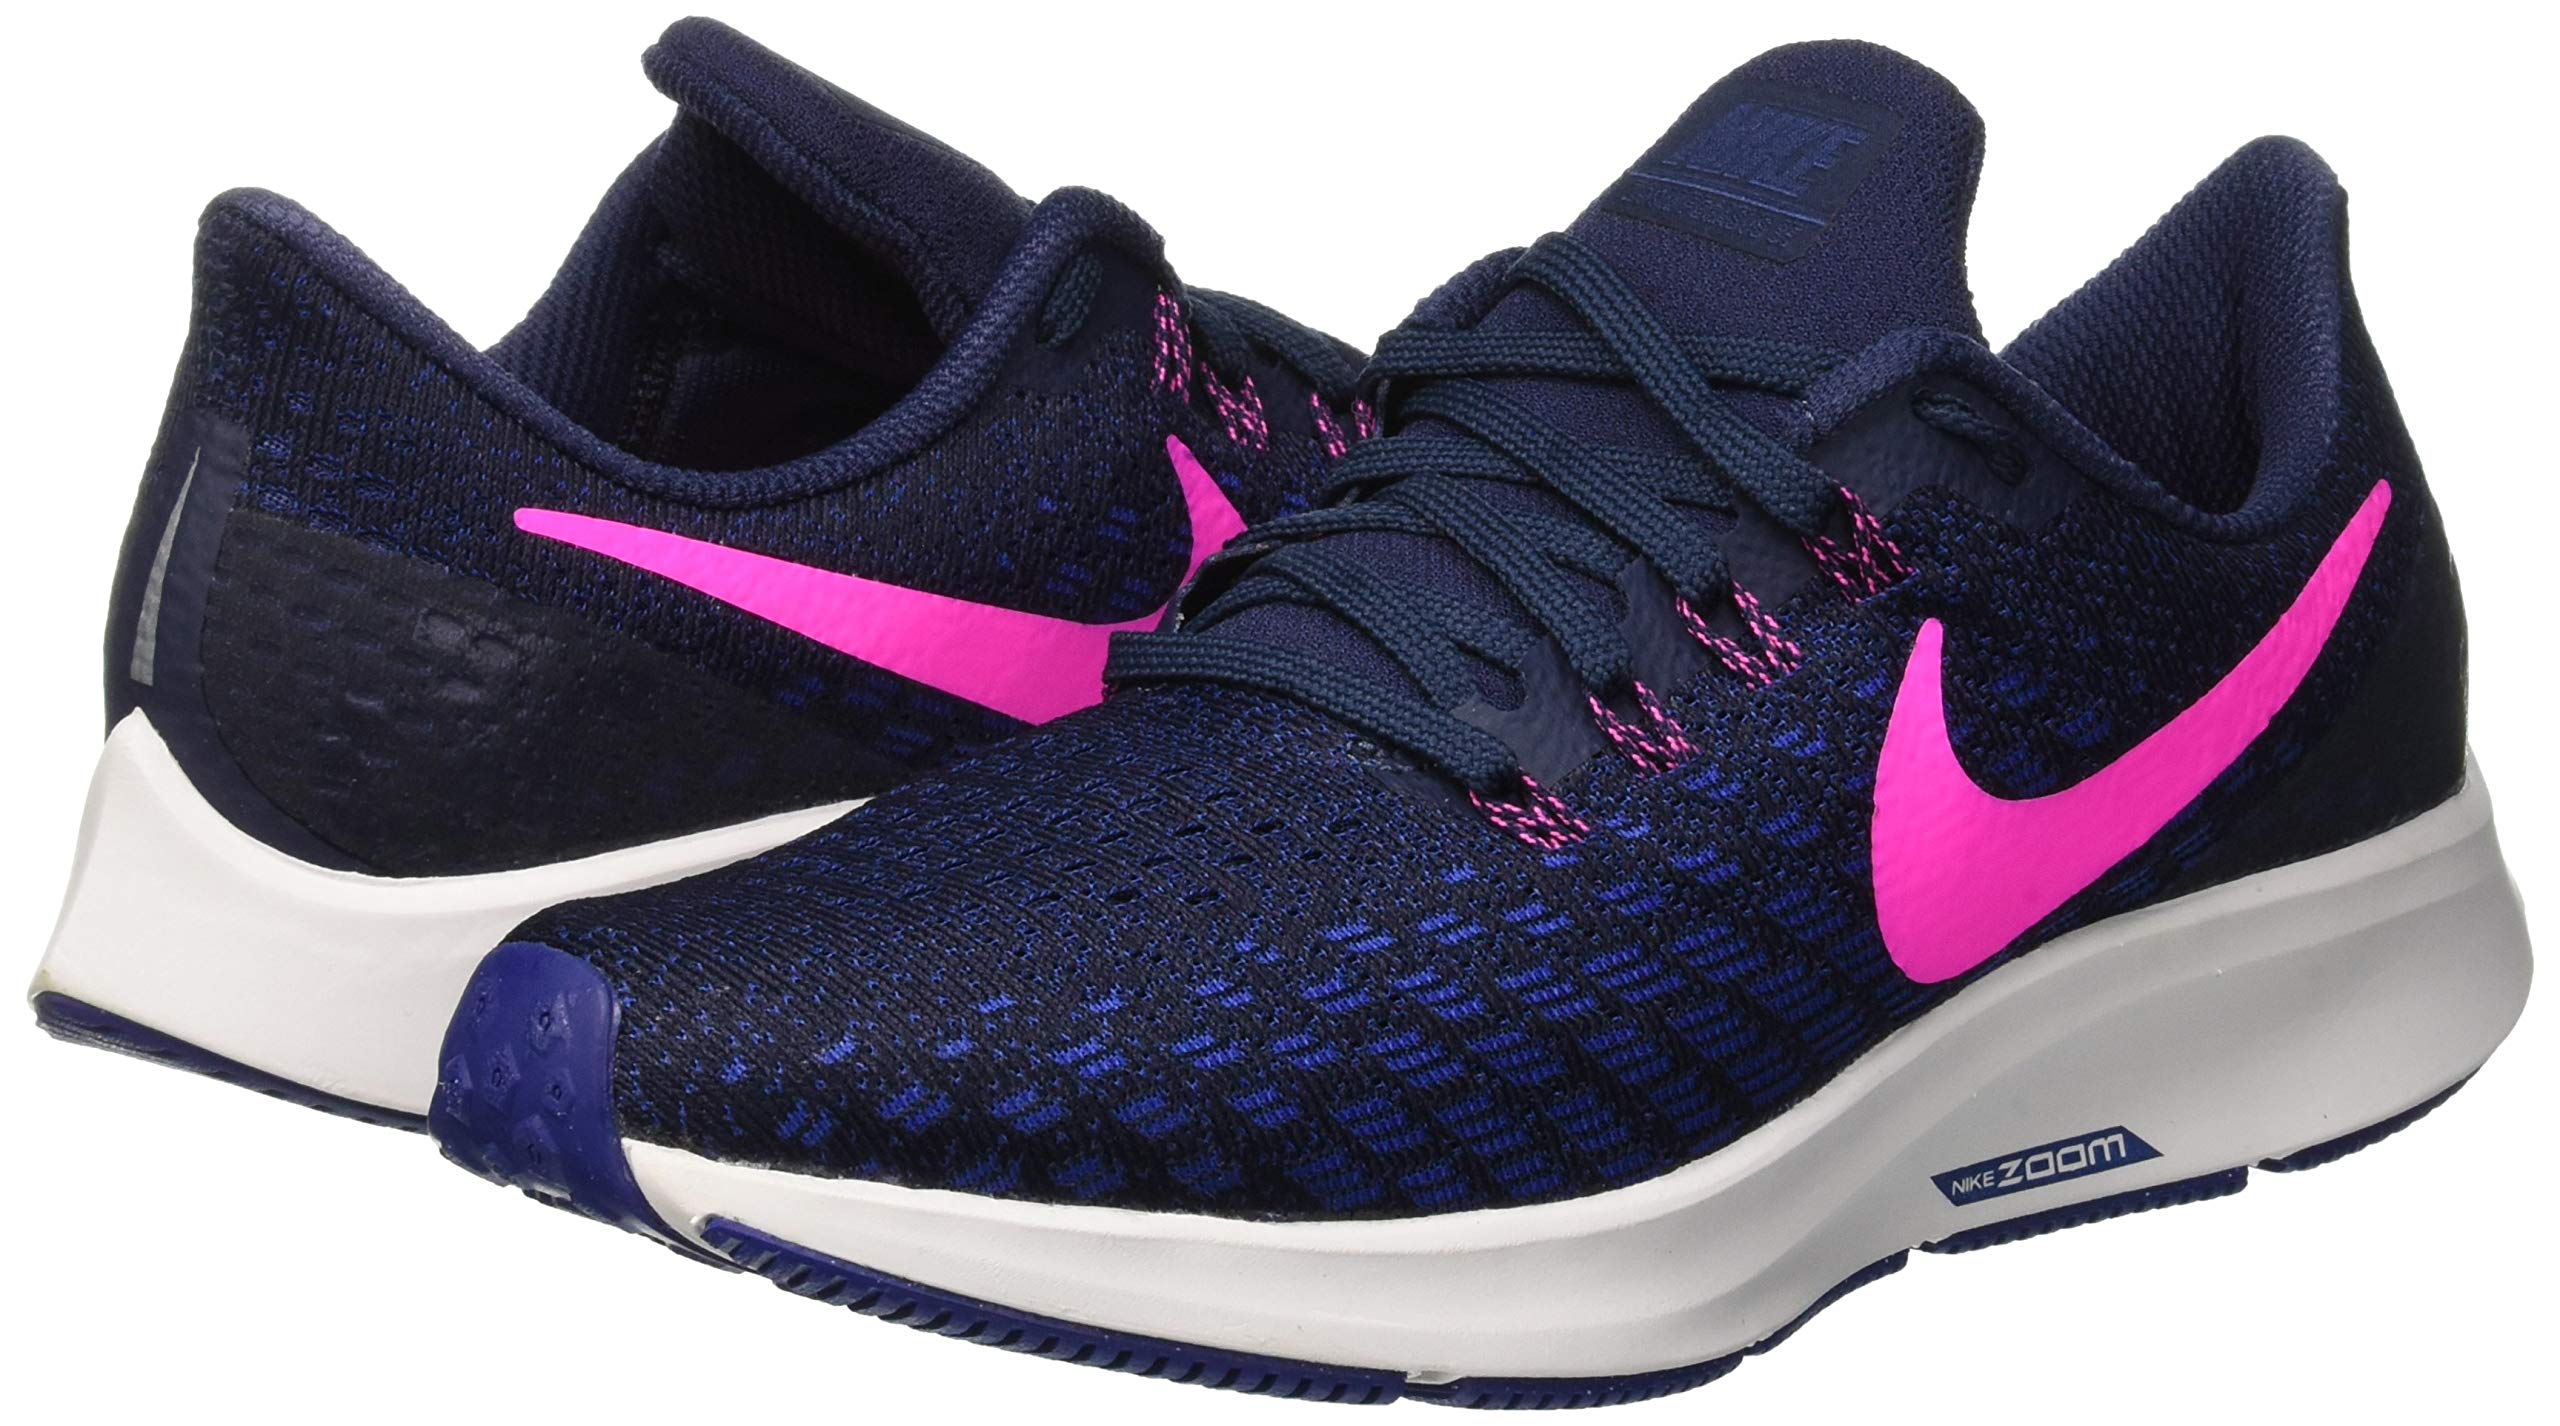 Nike Air Zoom Pegasus 35, Women's Running, Multicolored (Obsidian/Pink Blast/Deep Royal Blue 401), 4 UK (EU) by Nike (Image #5)